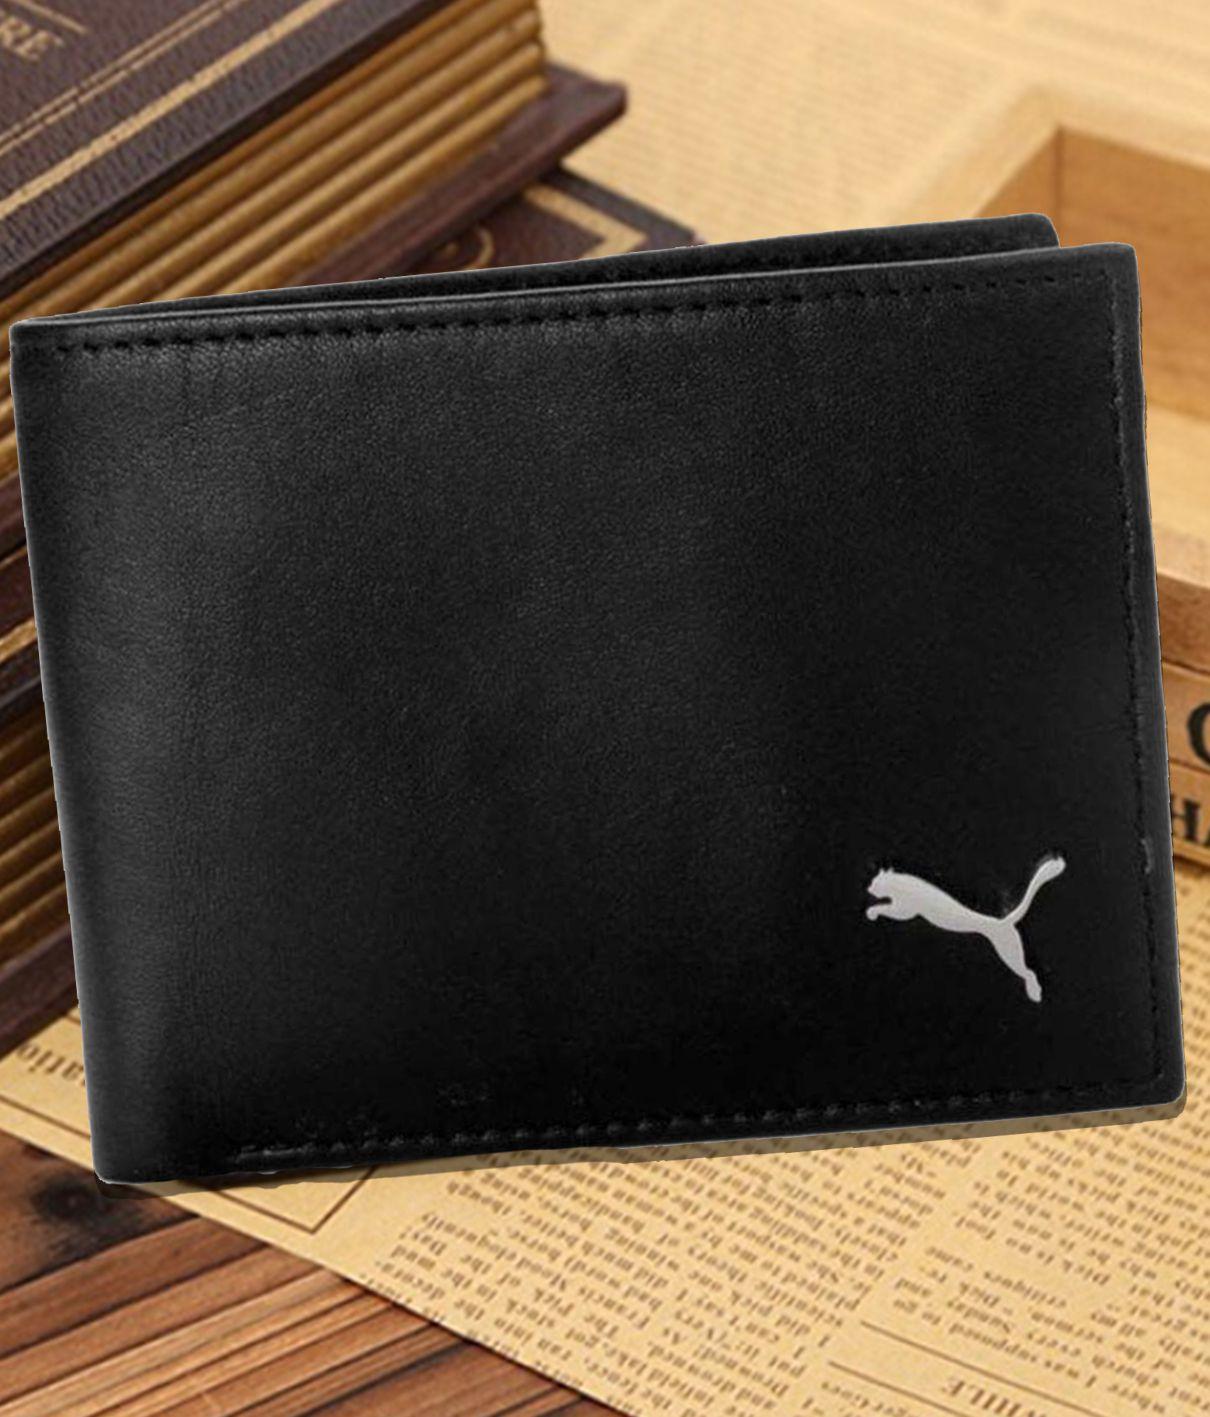 Puma F1 Leather Black Formal Regular Wallet